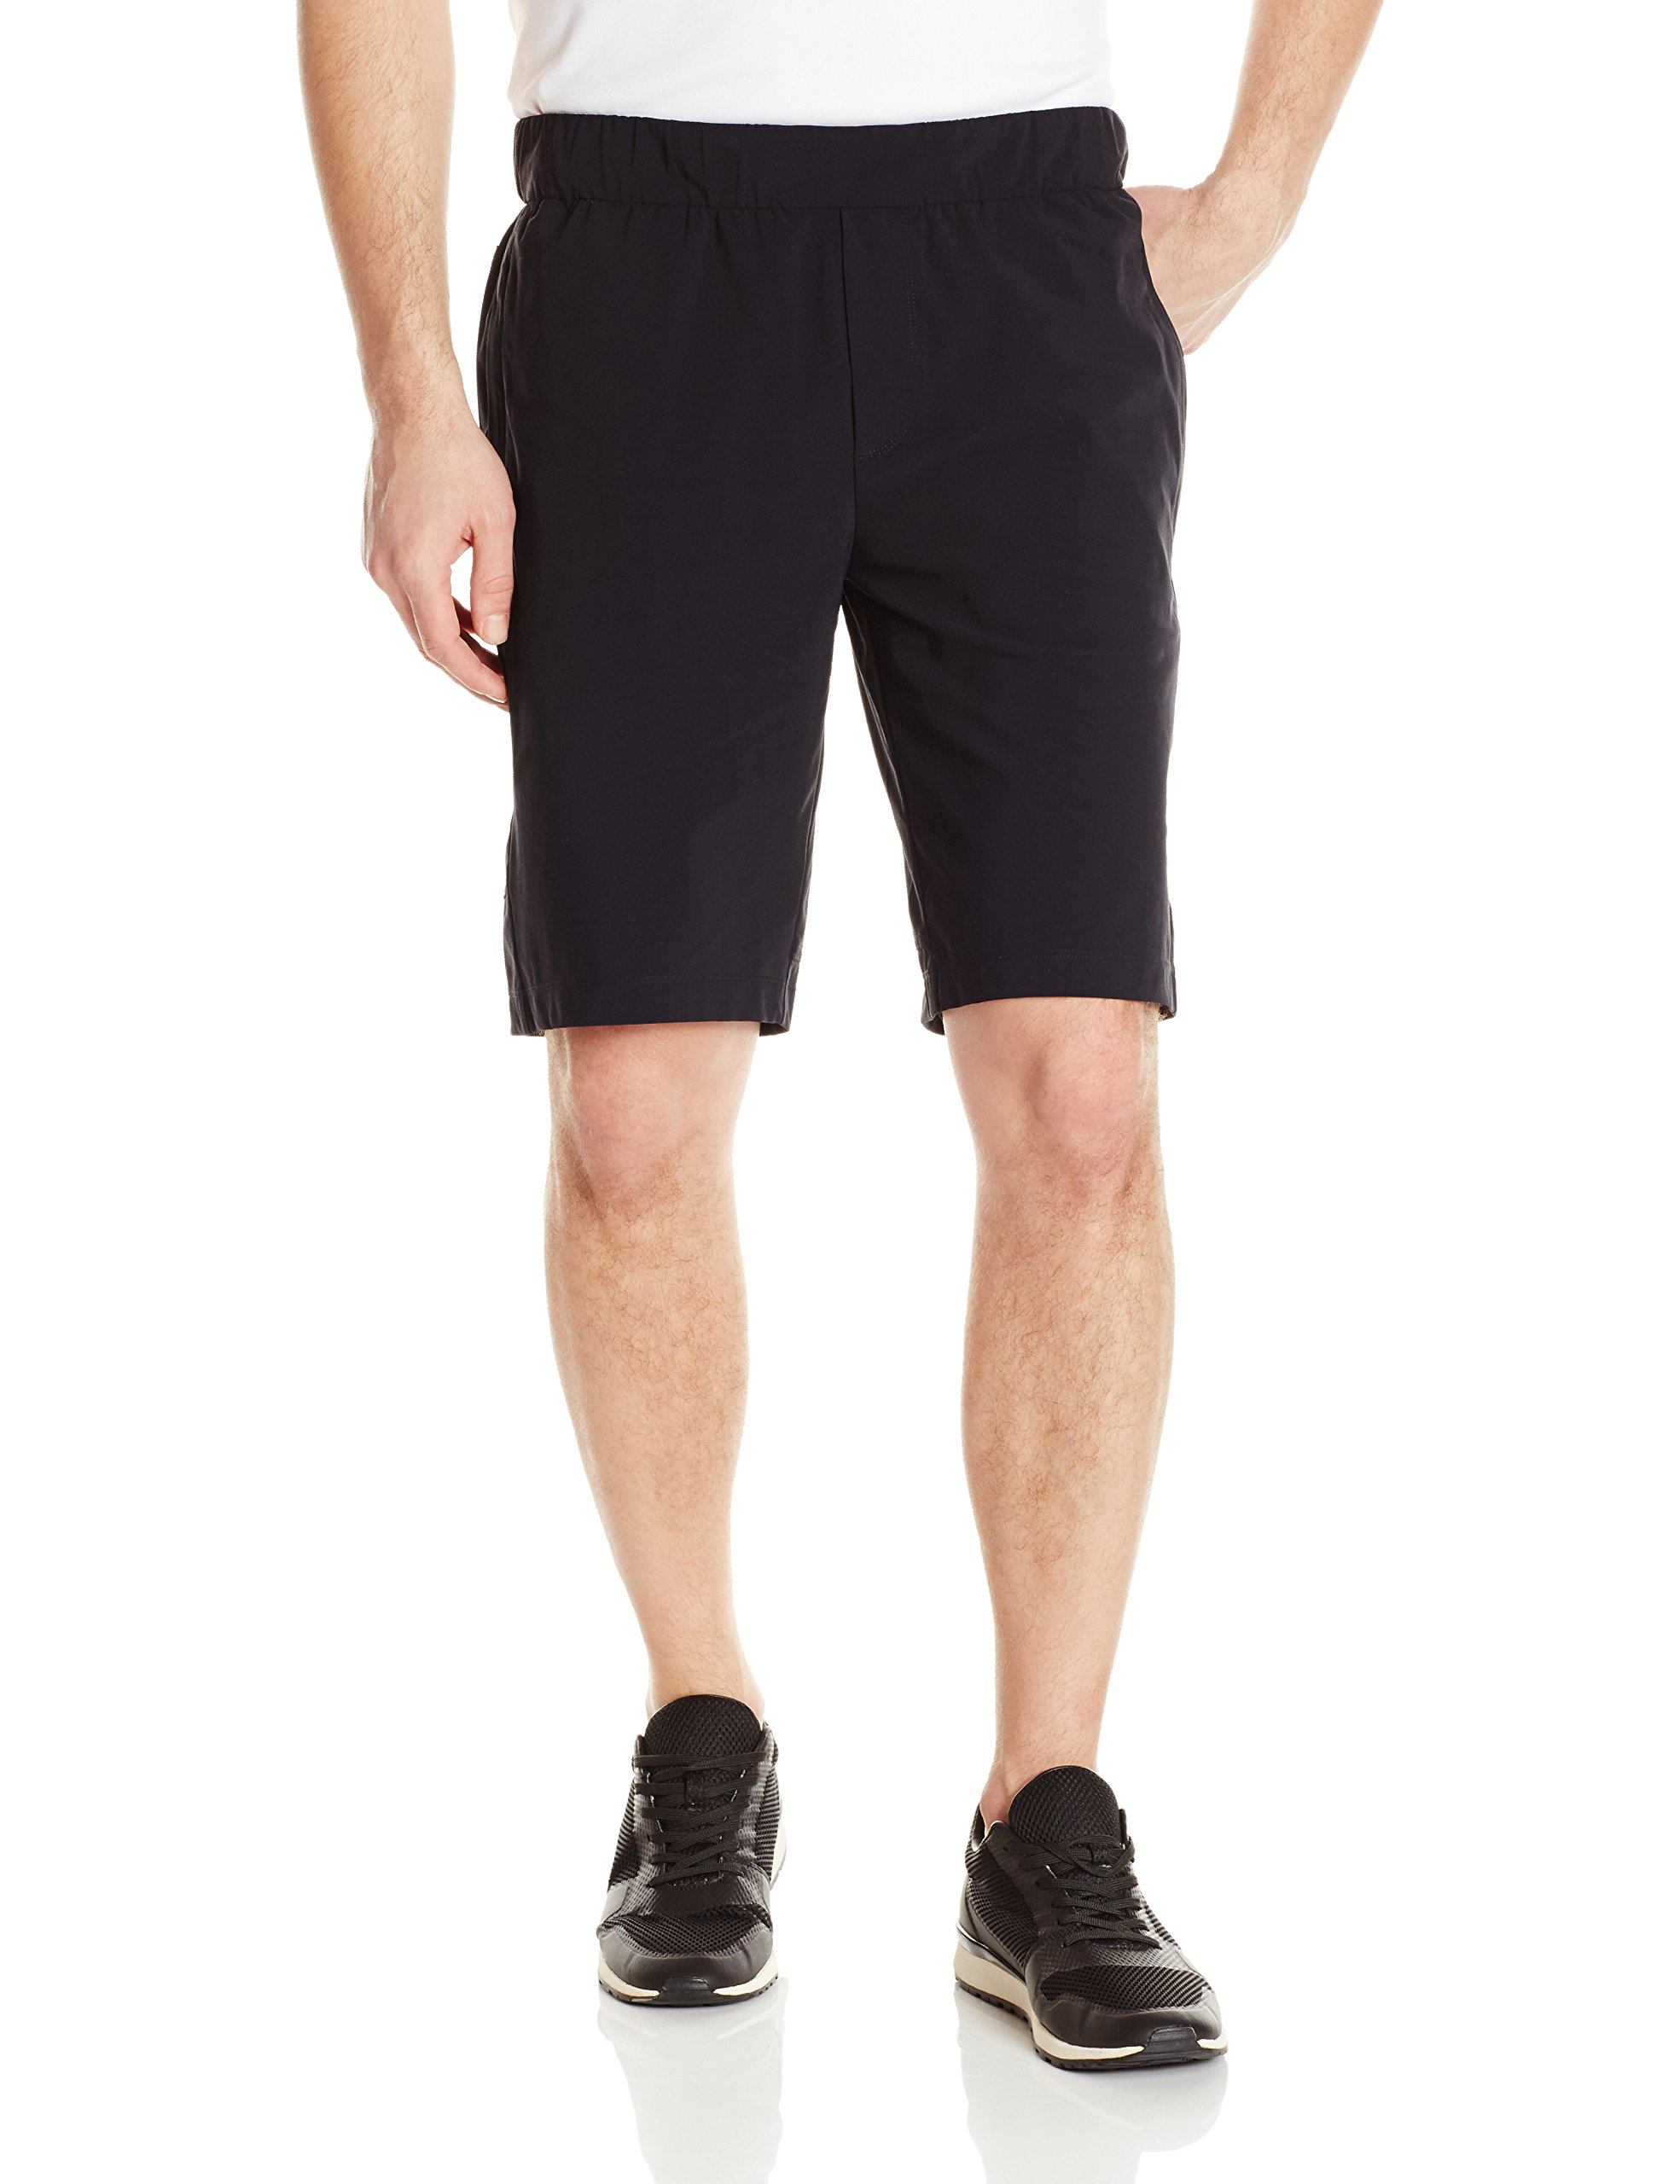 Vimmia Men's Marauder Macro Short, Black, Large by Vimmia (Image #1)